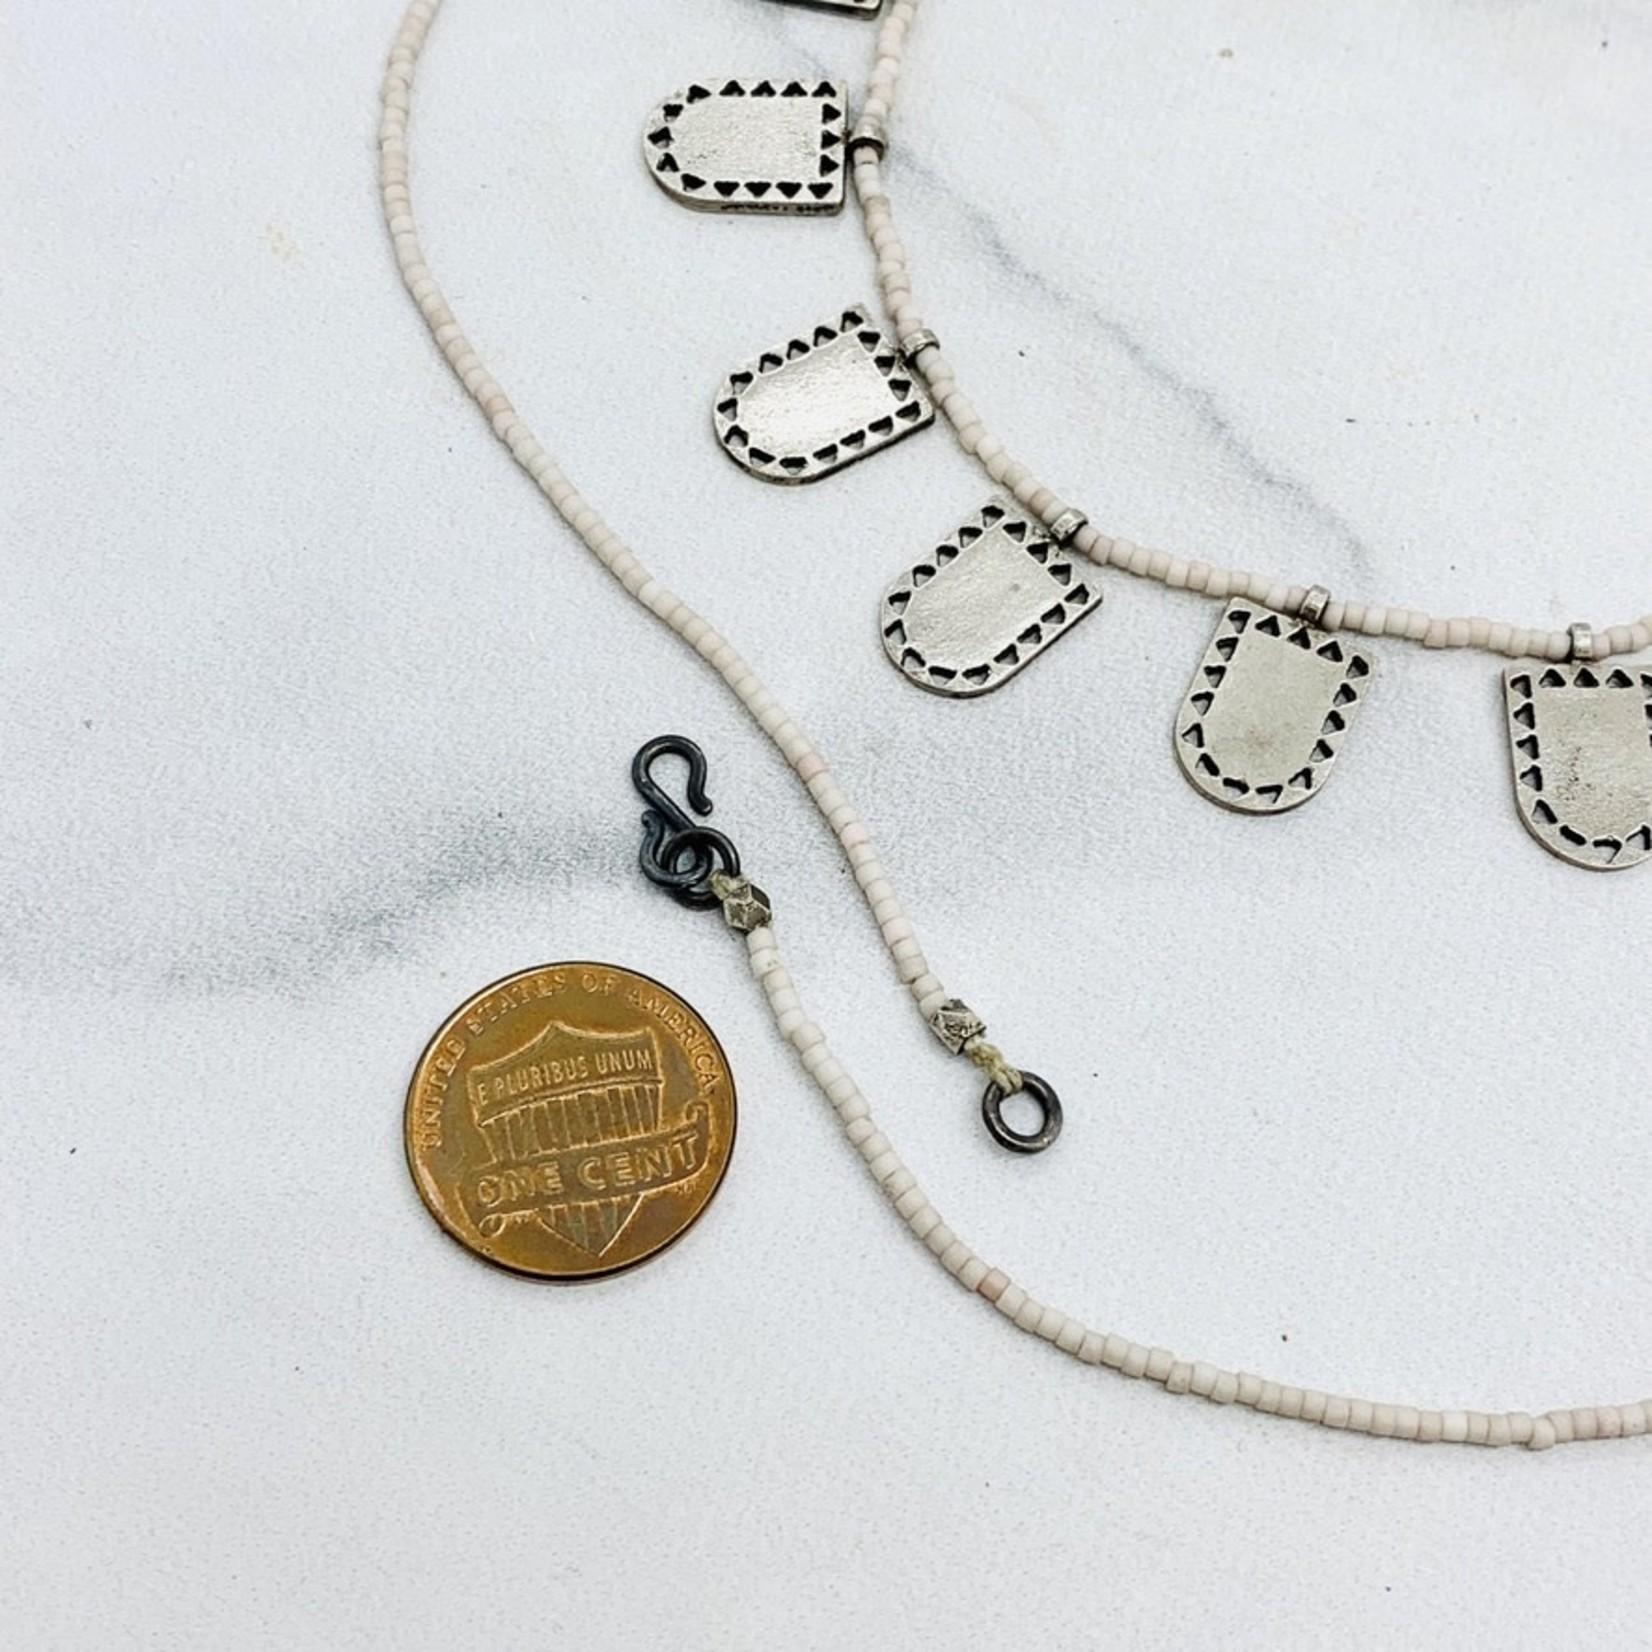 Silver Closed Portal Necklace by Molly M. Designs